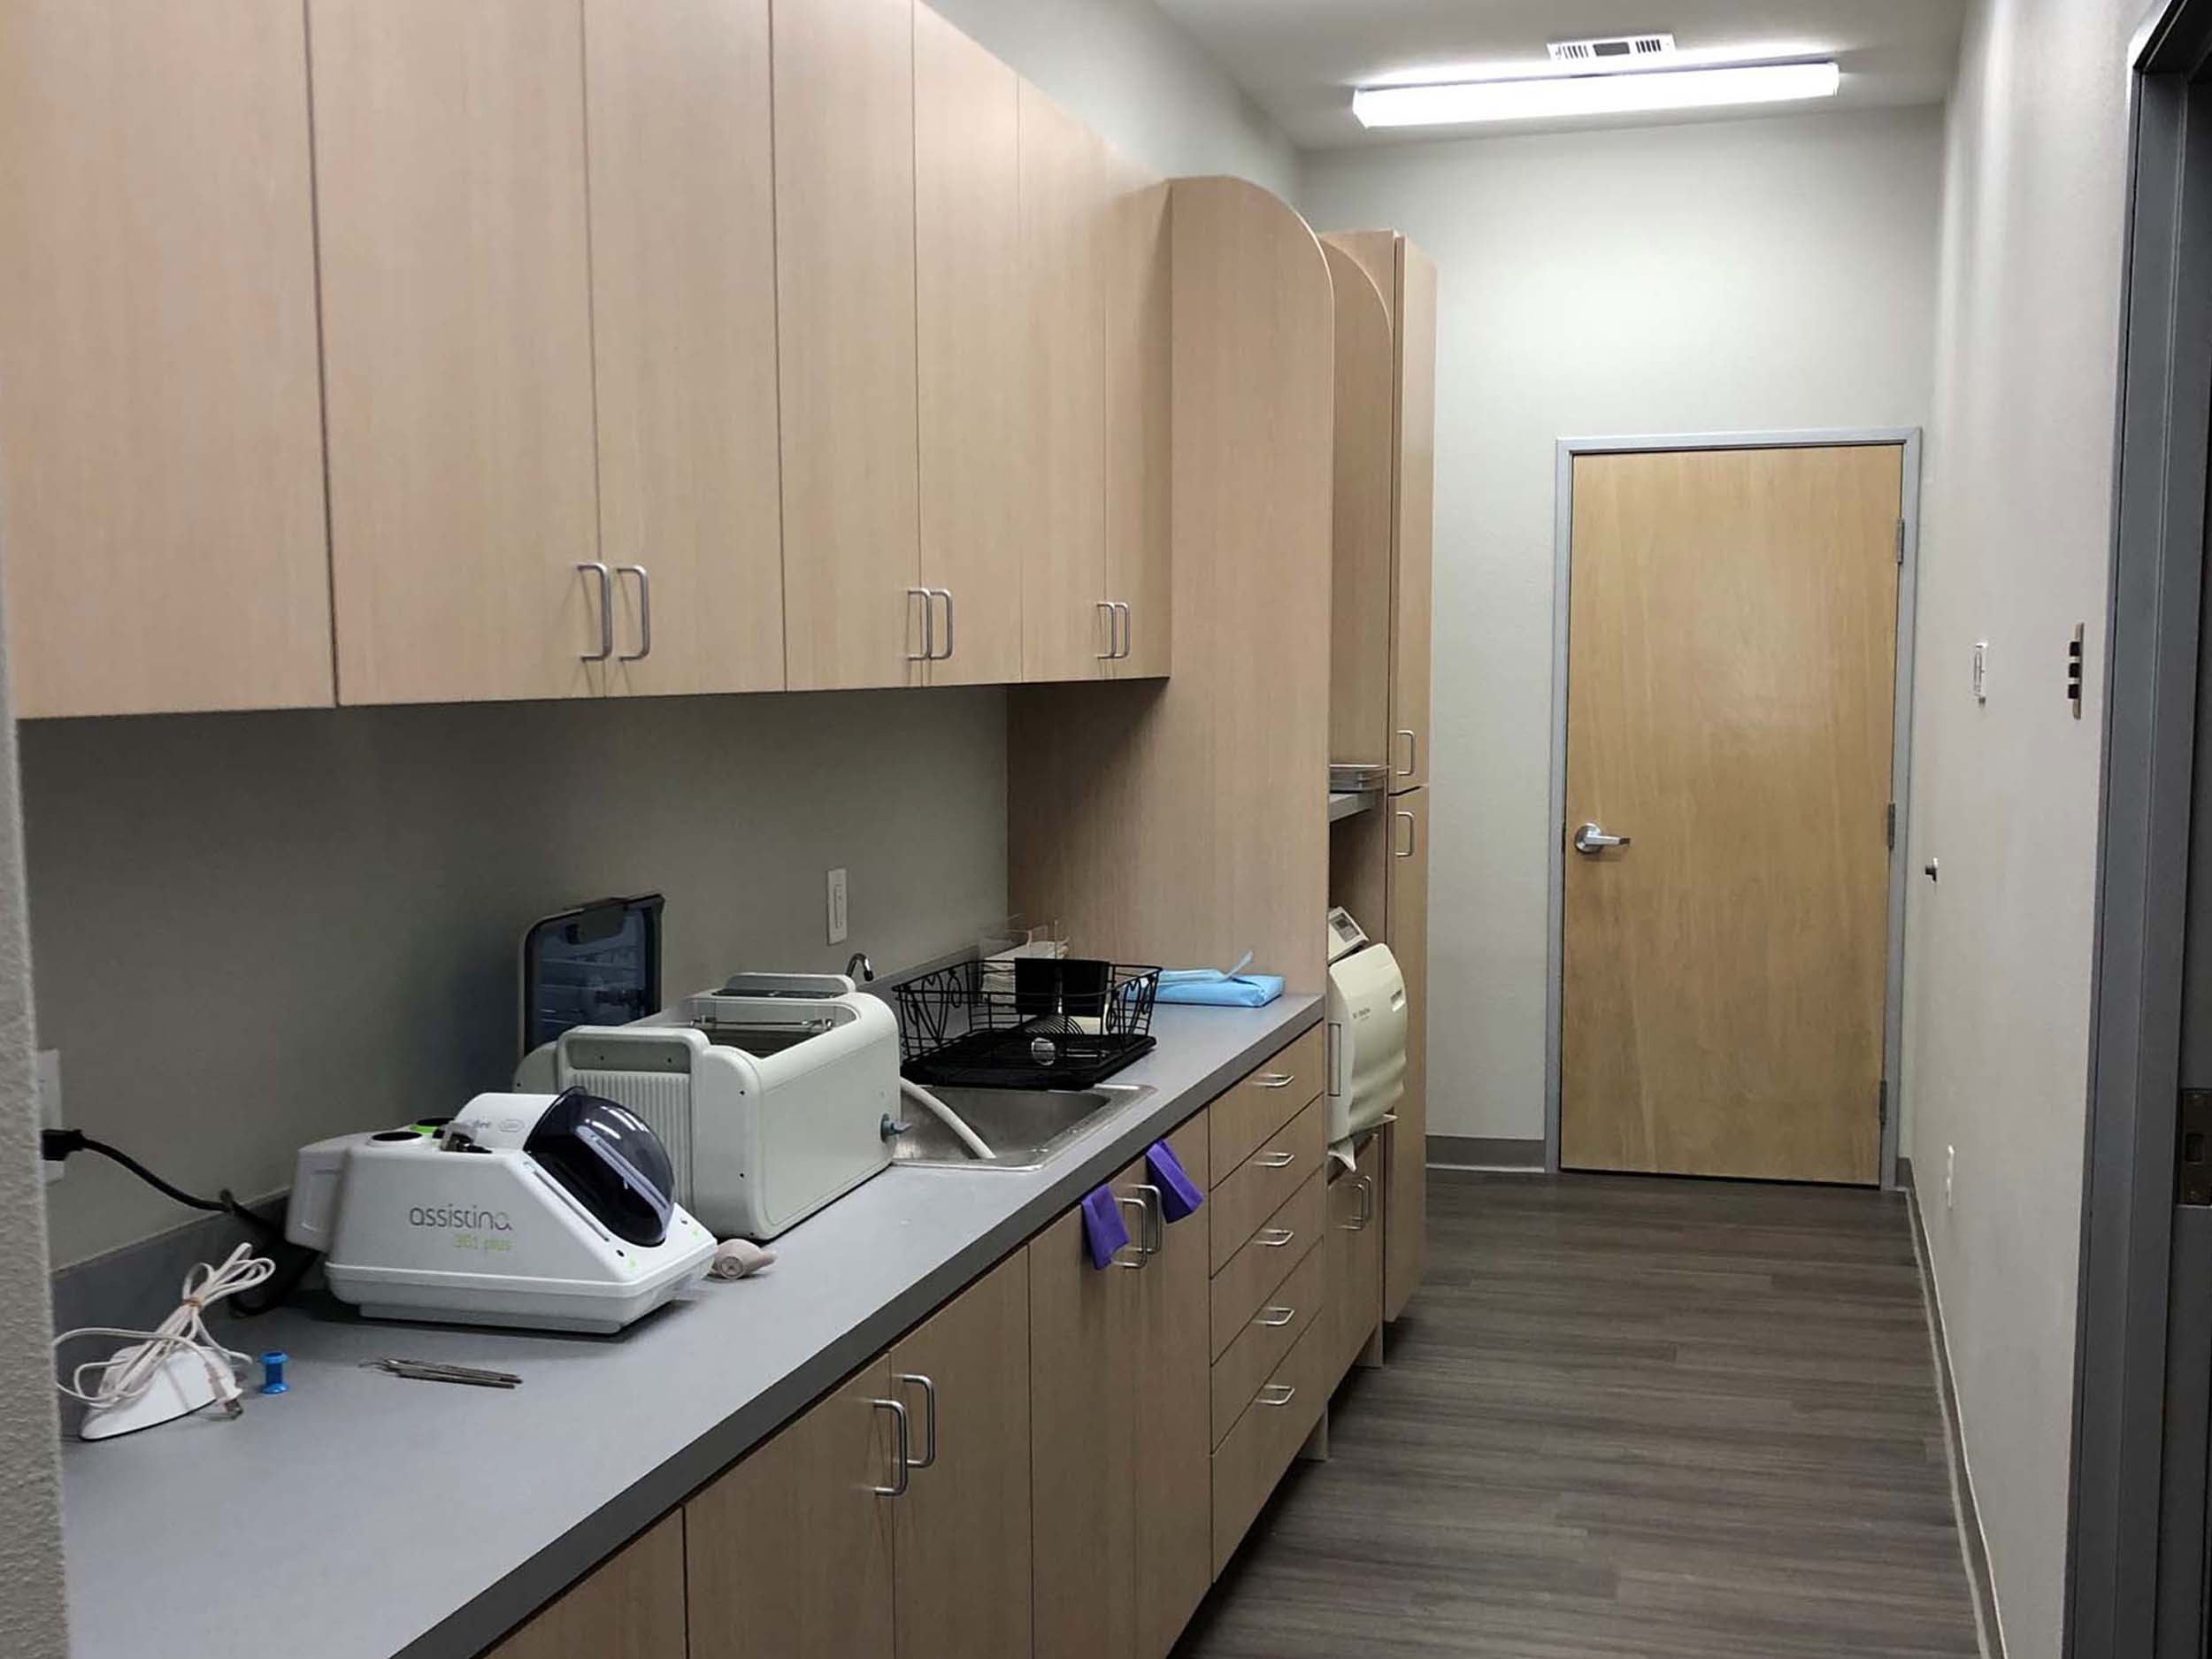 Heath Pediatric Sterilization Room